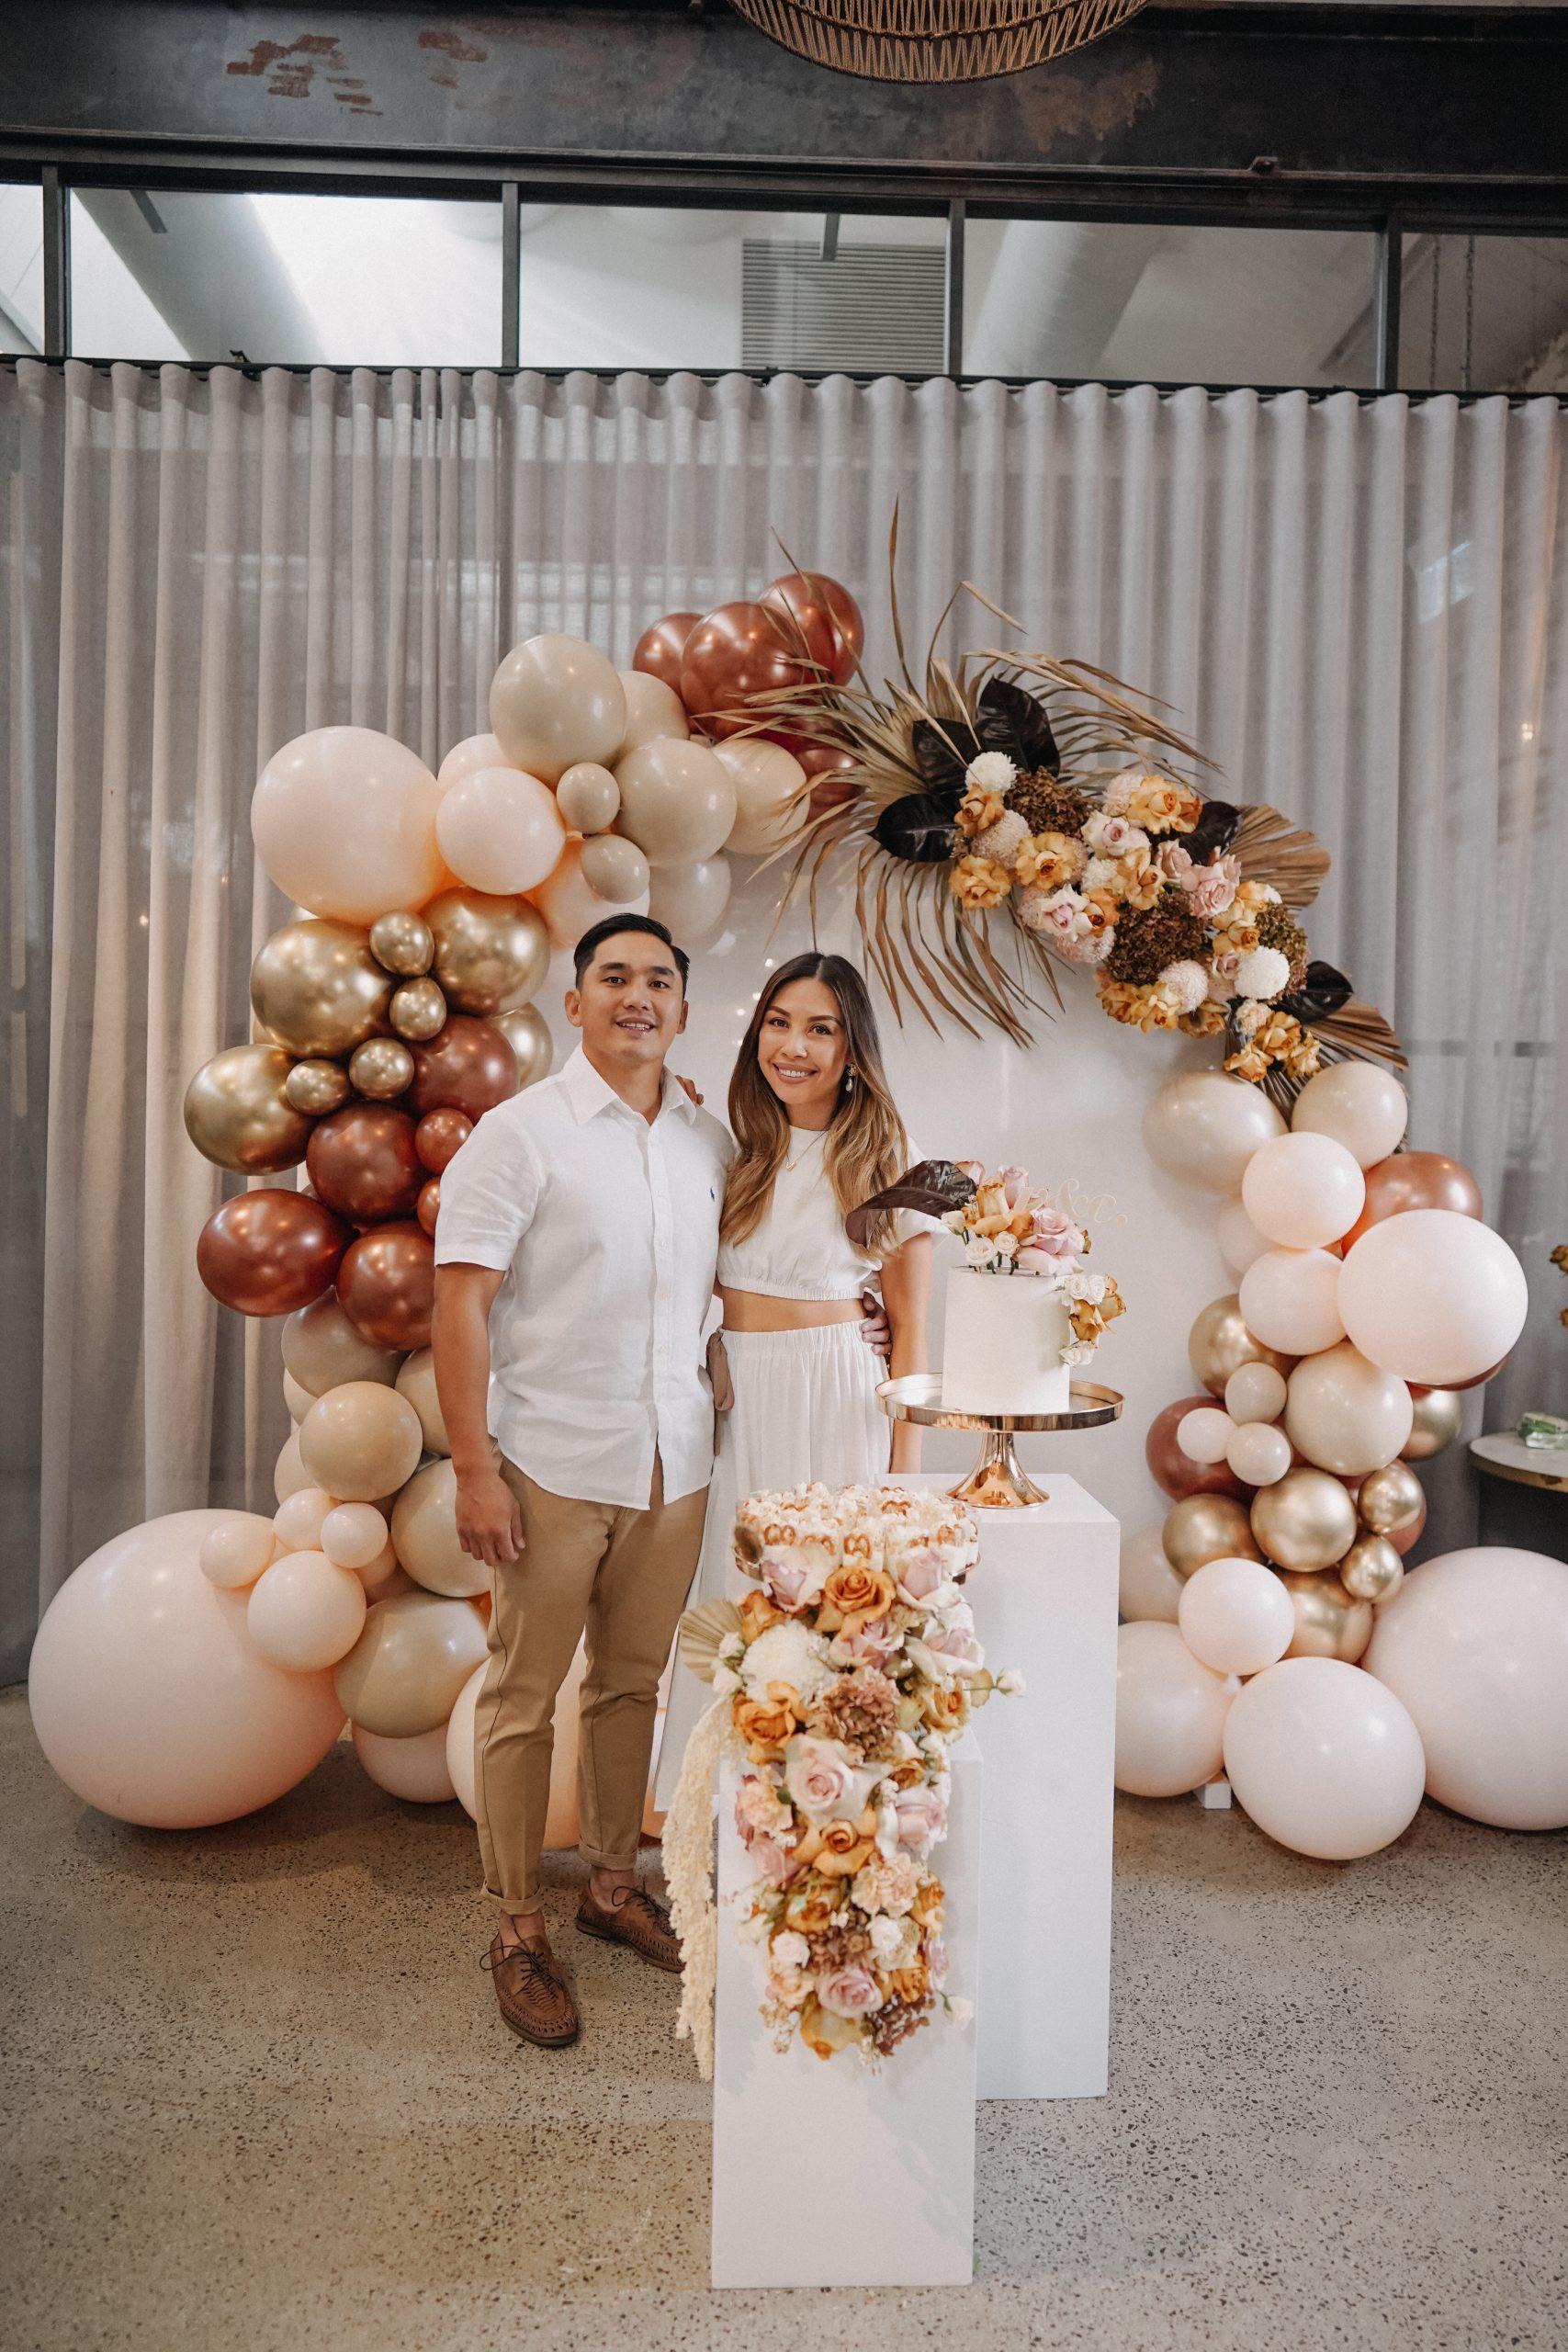 Vivian & Cleo's Engagement Party